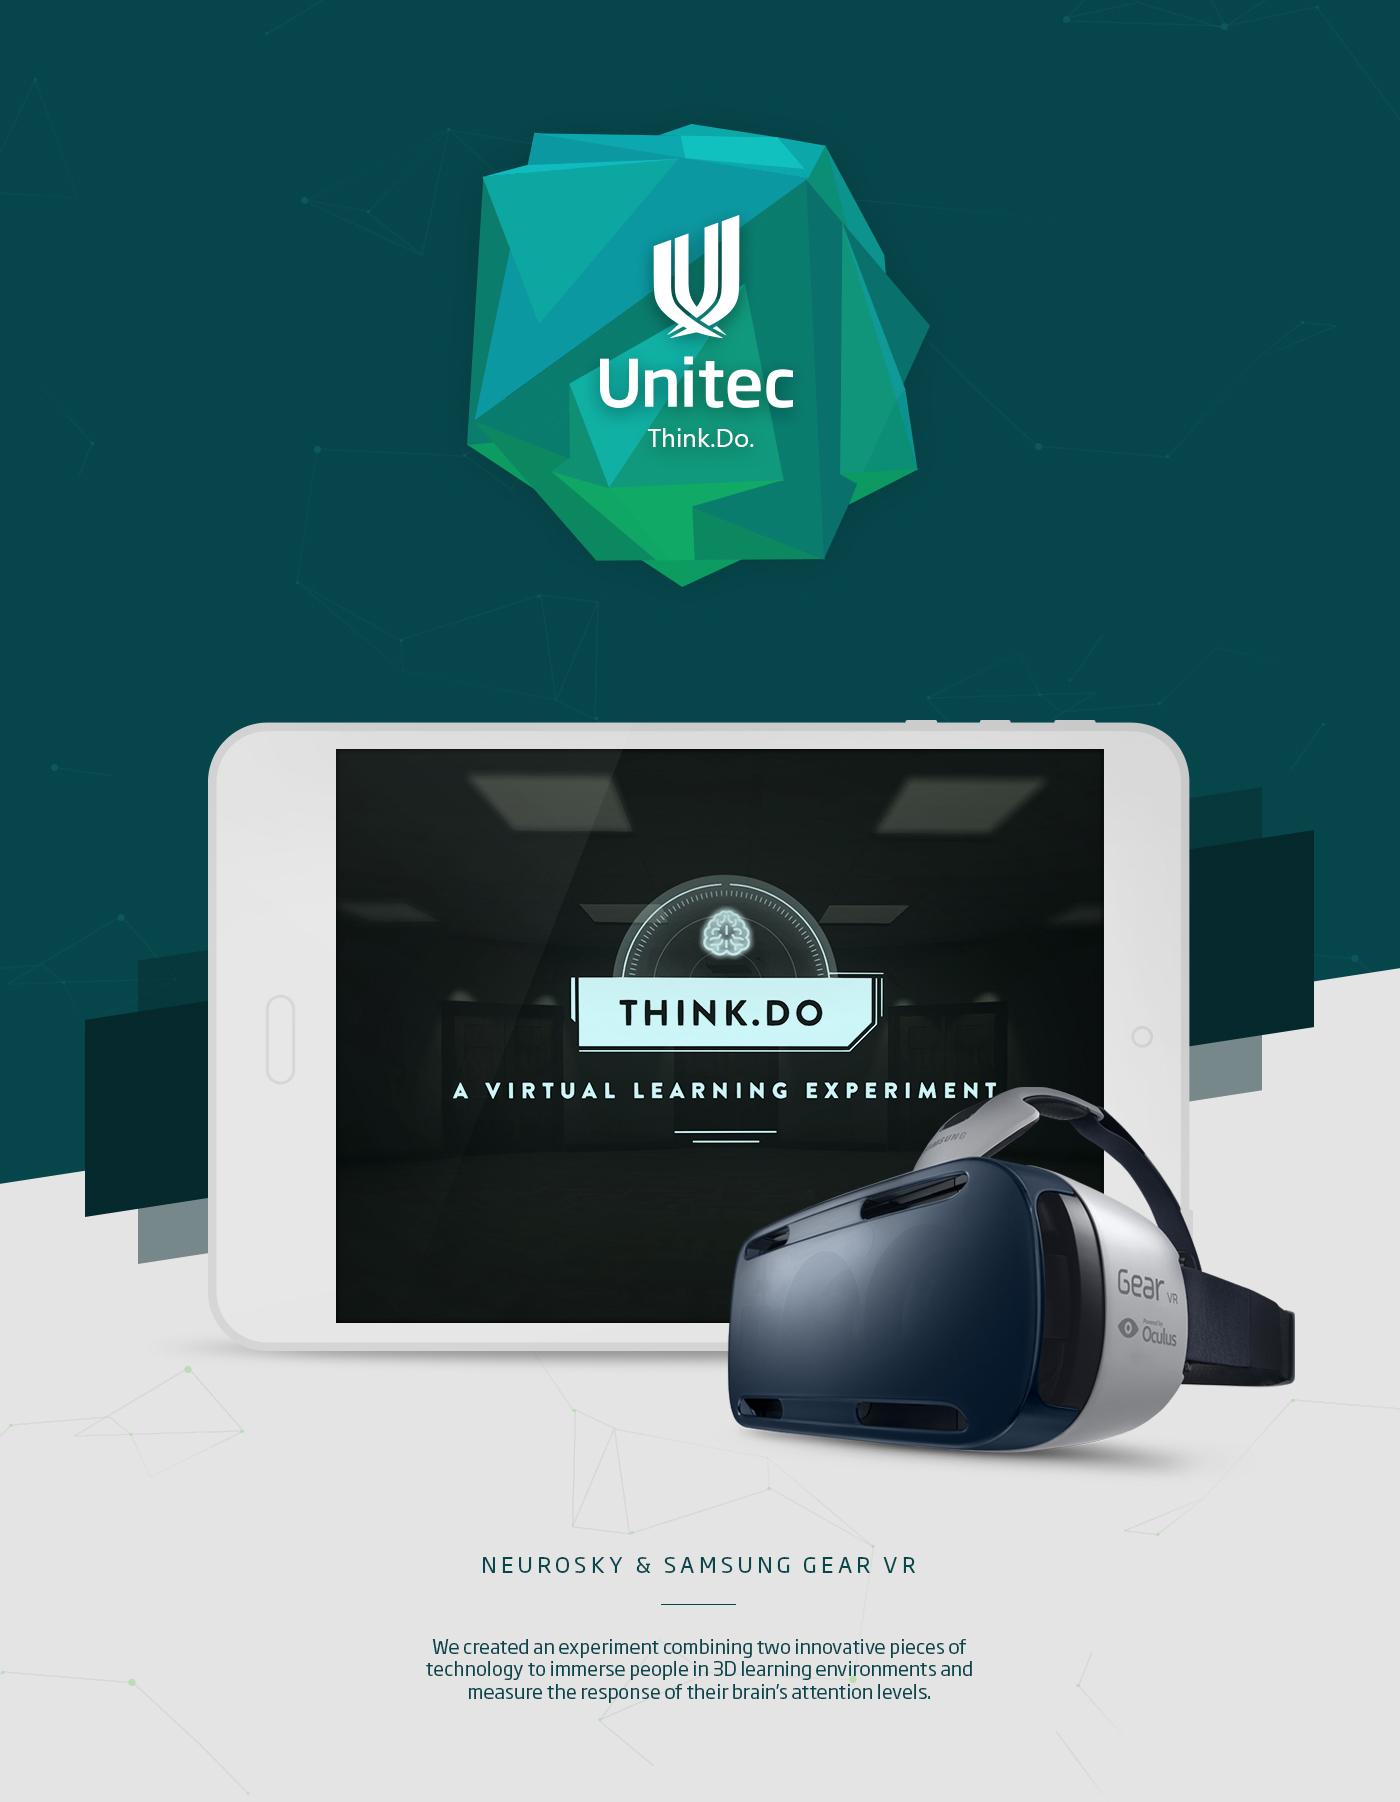 Virtual reality interactive Samsung Gear VR Neurosky